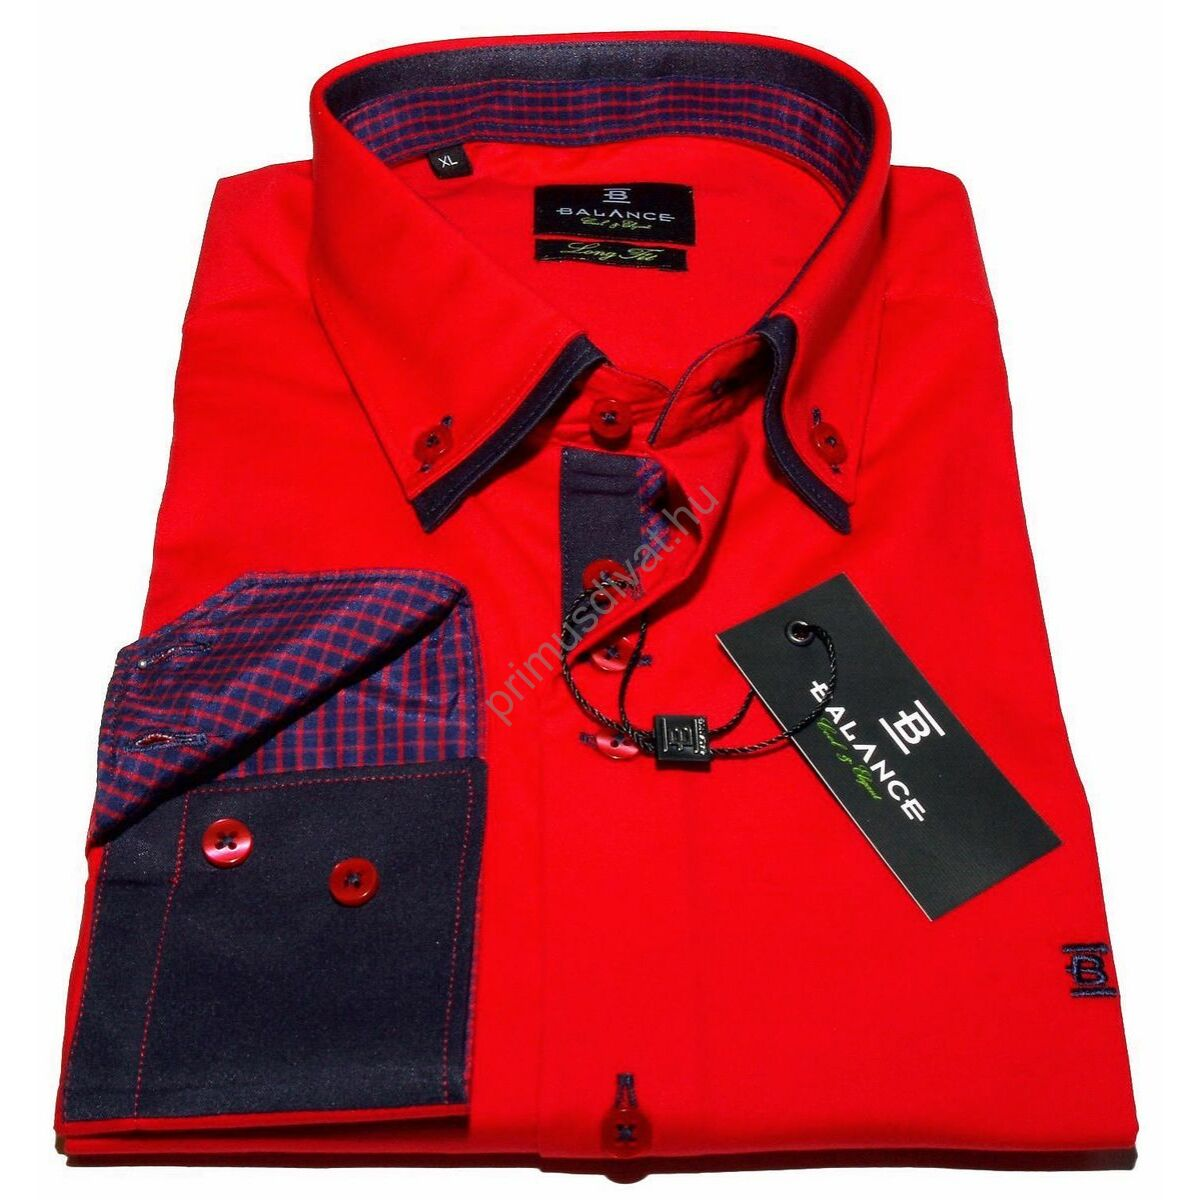 5ff21c14dd Balance dupla, legombolt galléros rugalmas, karcsúsított hosszú ujjú ing,  piros-kék